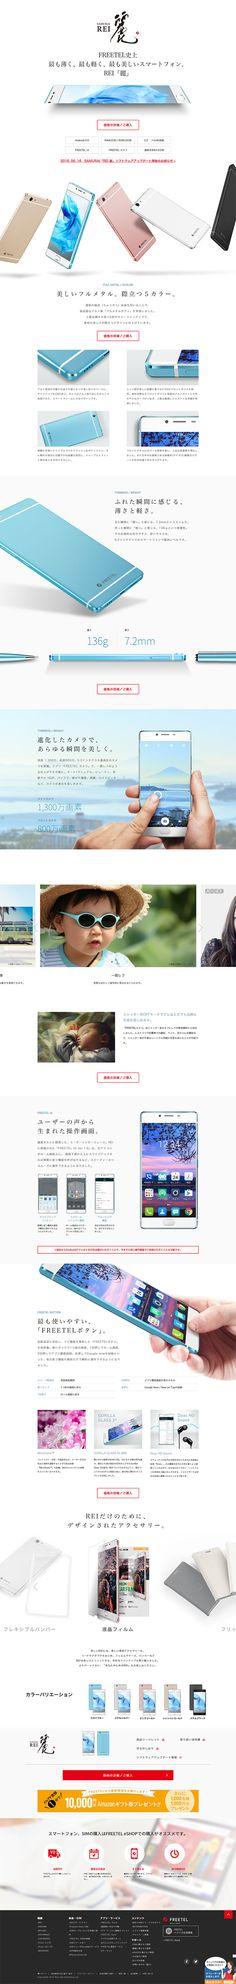 REI「麗」 レイ【家電・パソコン・通信関連】のLPデザイン。WEBデザイナーさん必見!ランディングページのデザイン参考に(シンプル系)